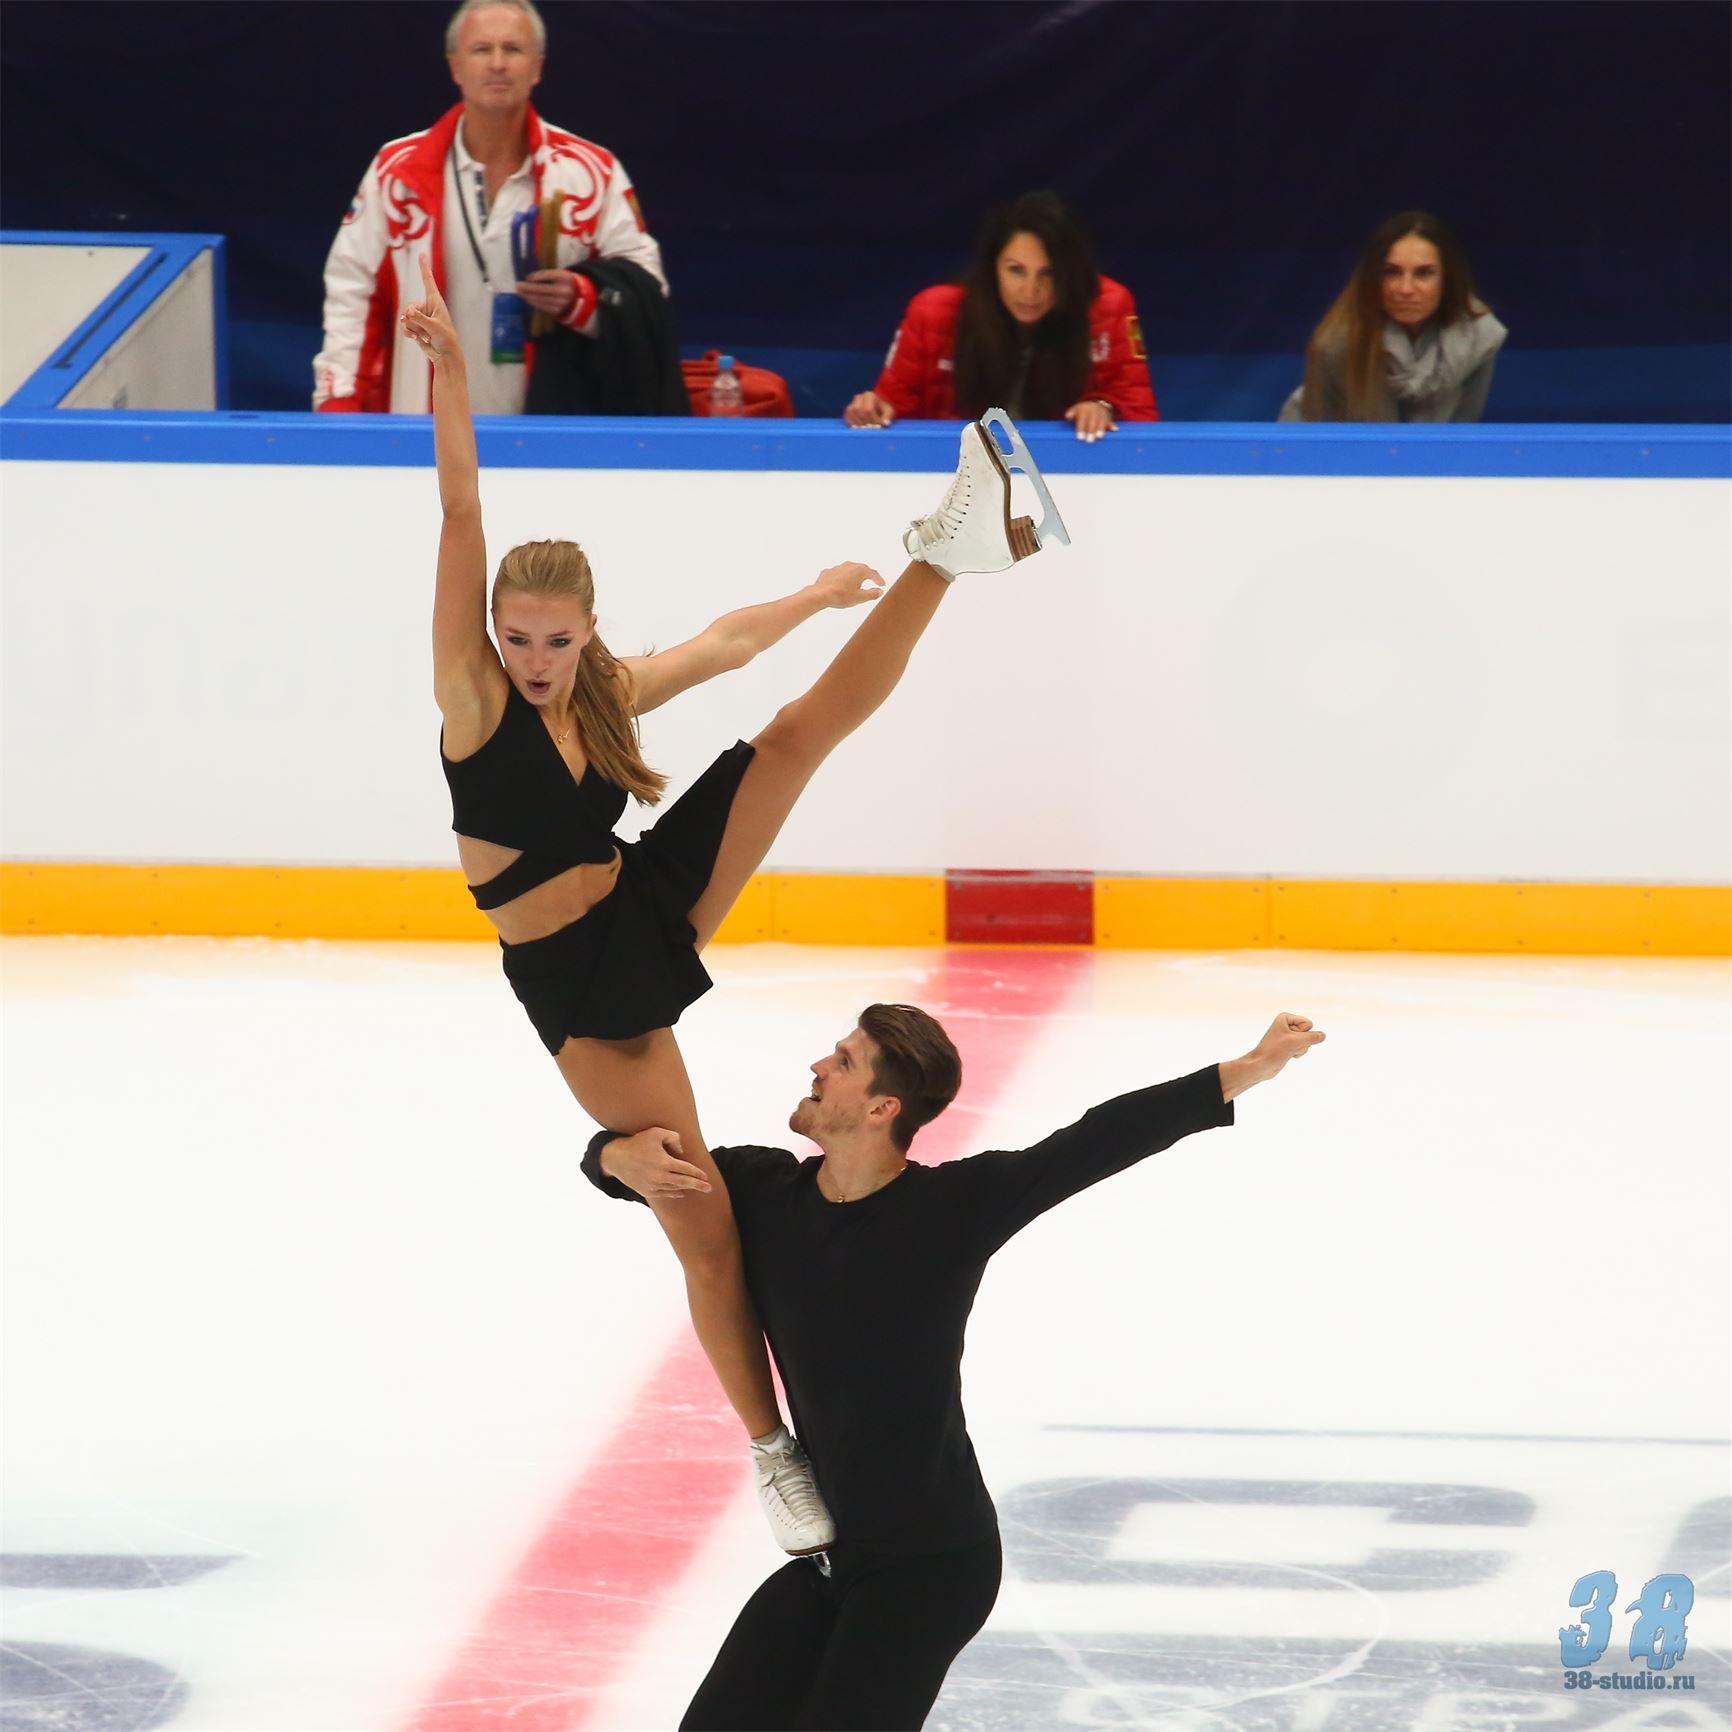 Александра Степанова - Иван Букин  - Страница 49 OCyQ1xlaYls